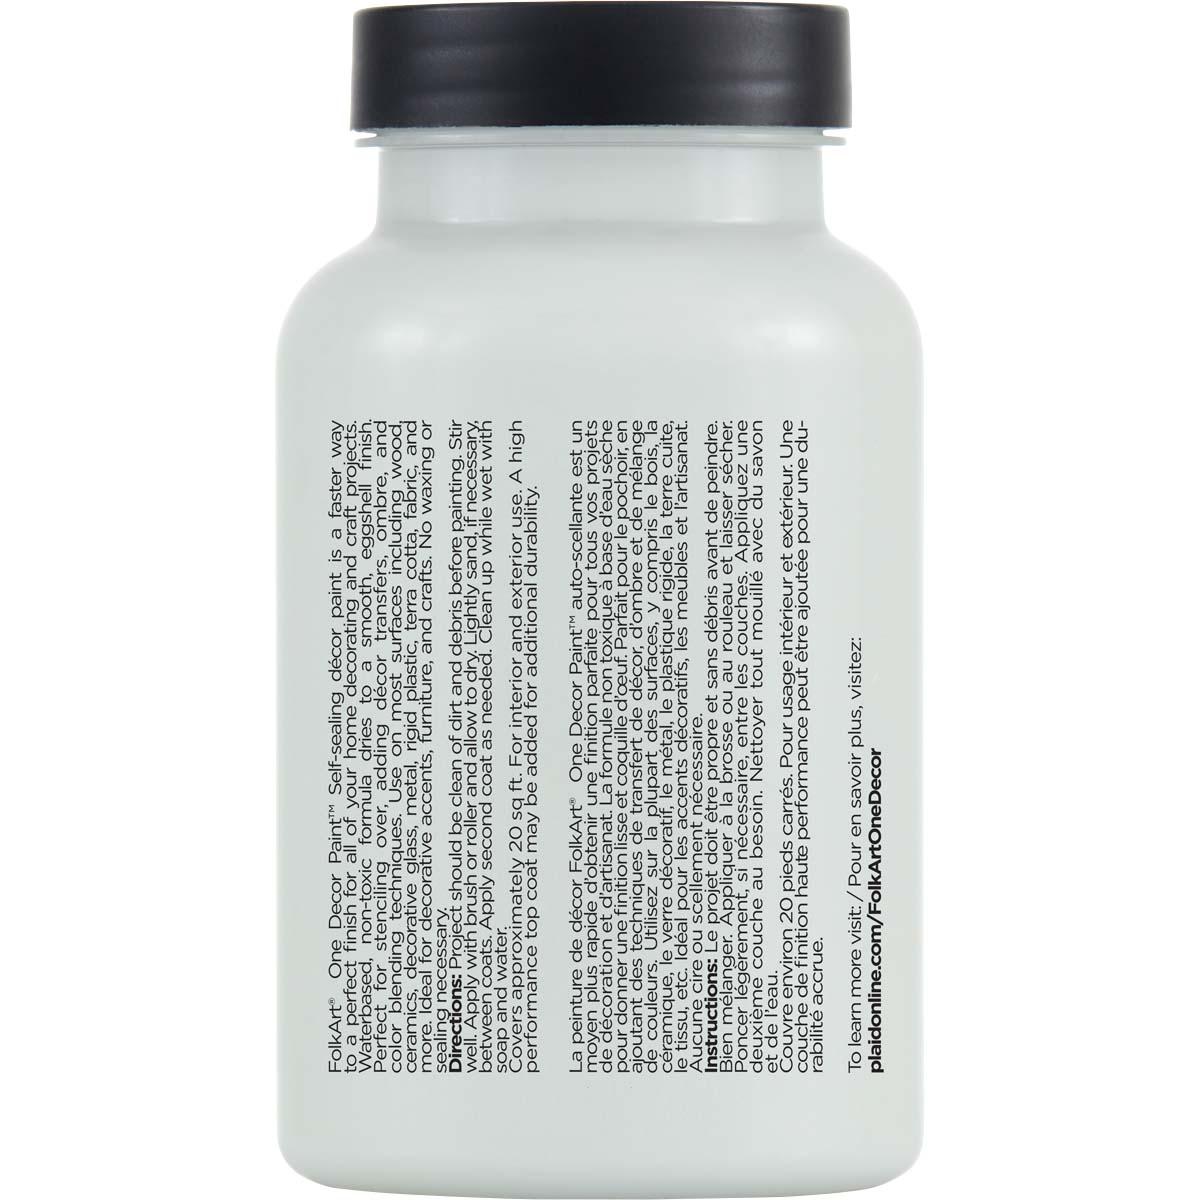 FolkArt ® One Décor Paint™ - Raindrop, 8 oz. - 36066